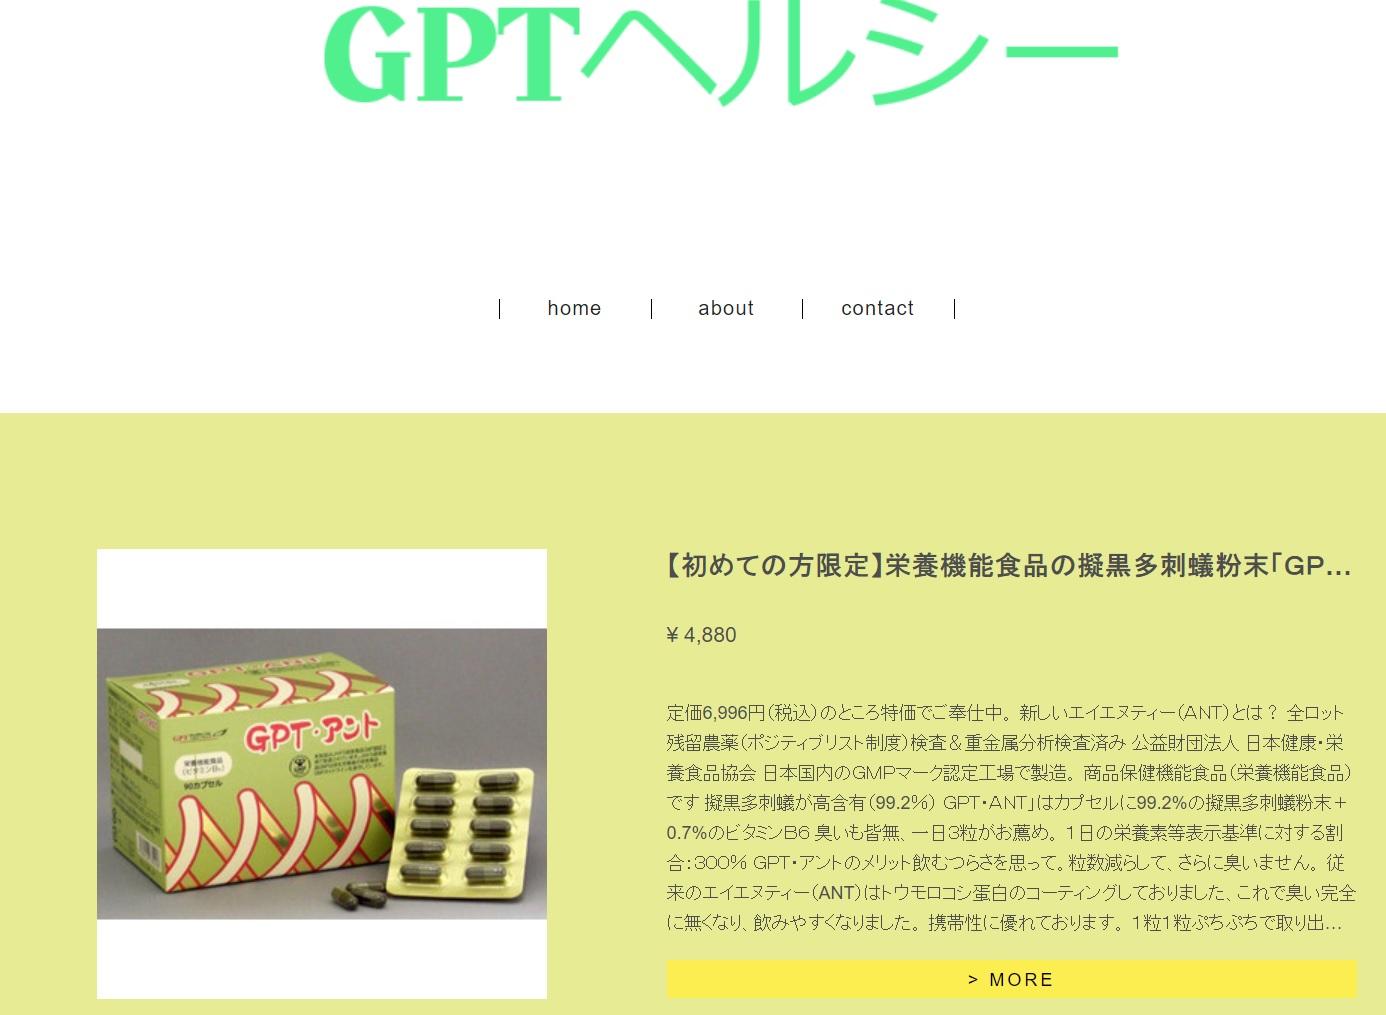 base-shop-gpt.jp割引サイト